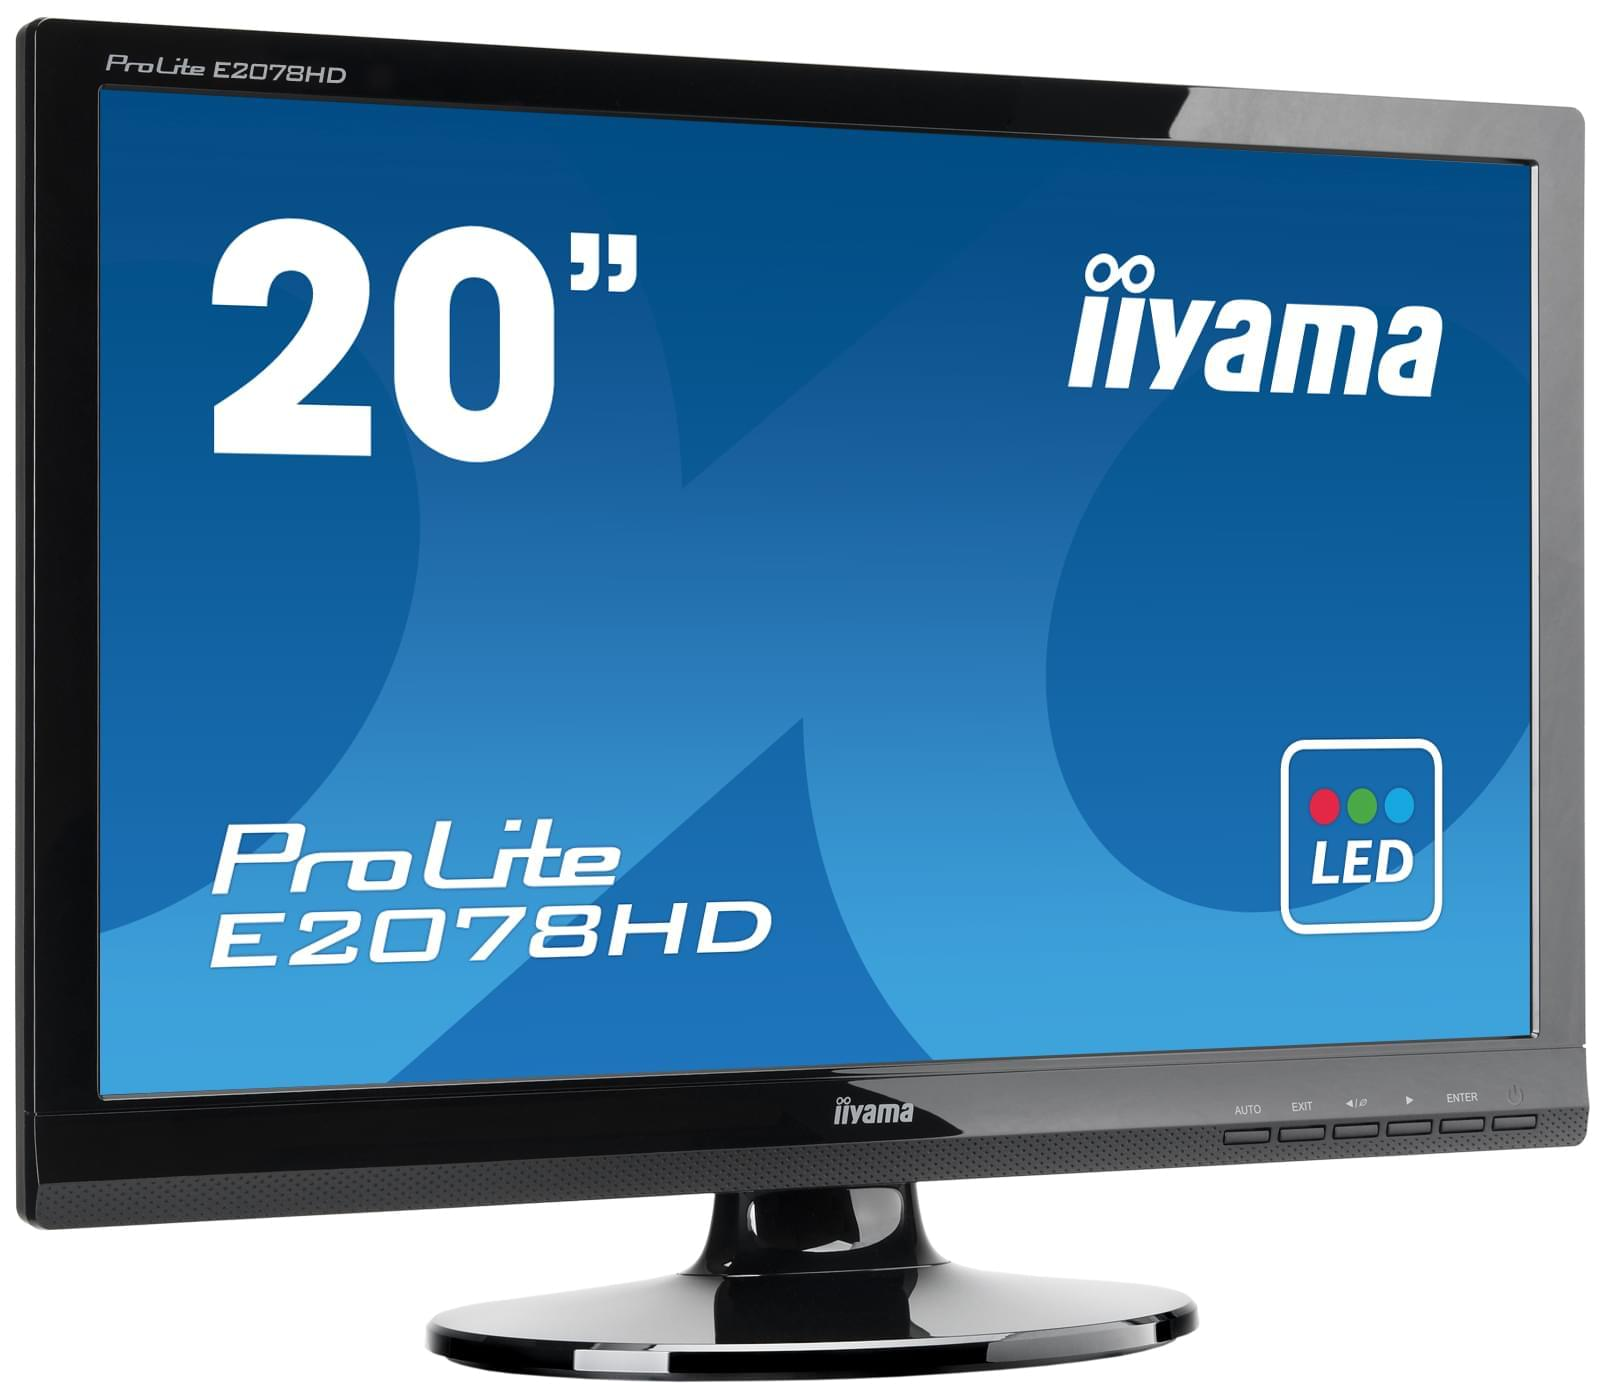 Iiyama E2078HD-GB1 (E2078HD-GB1) - Achat / Vente Ecran PC sur Cybertek.fr - 0